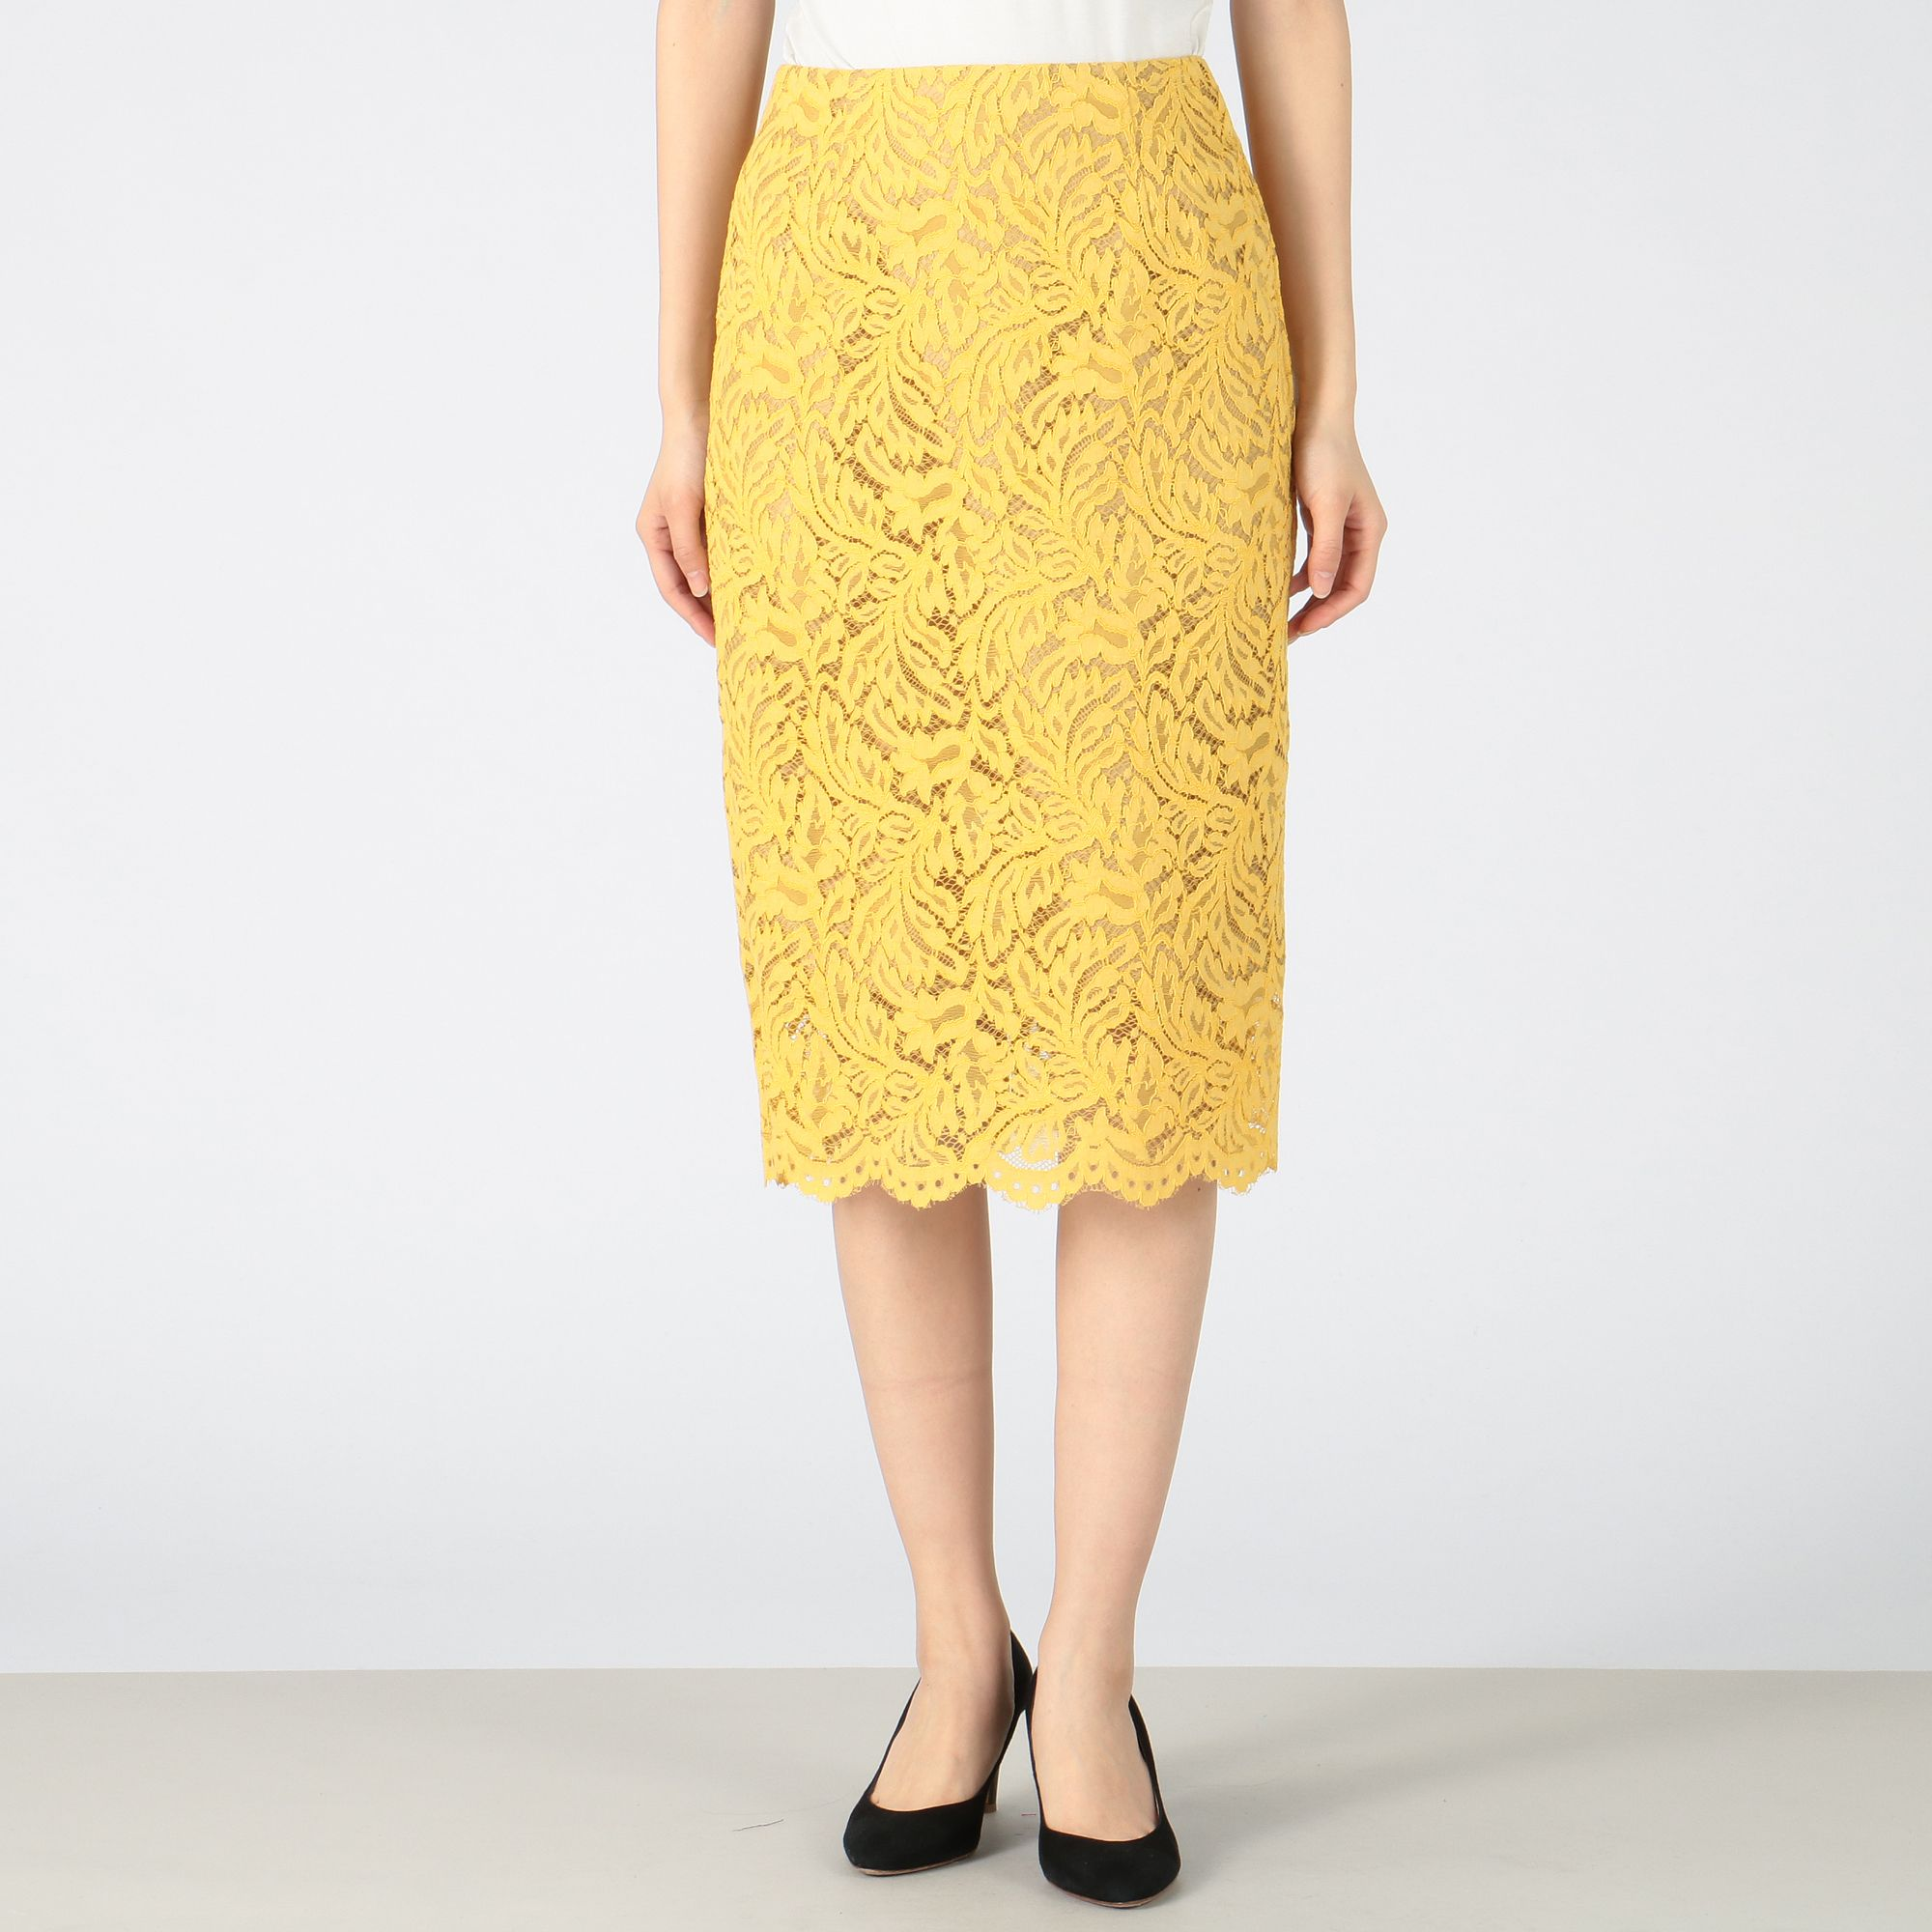 PARIGOTパリゴ/レースタイトスカート